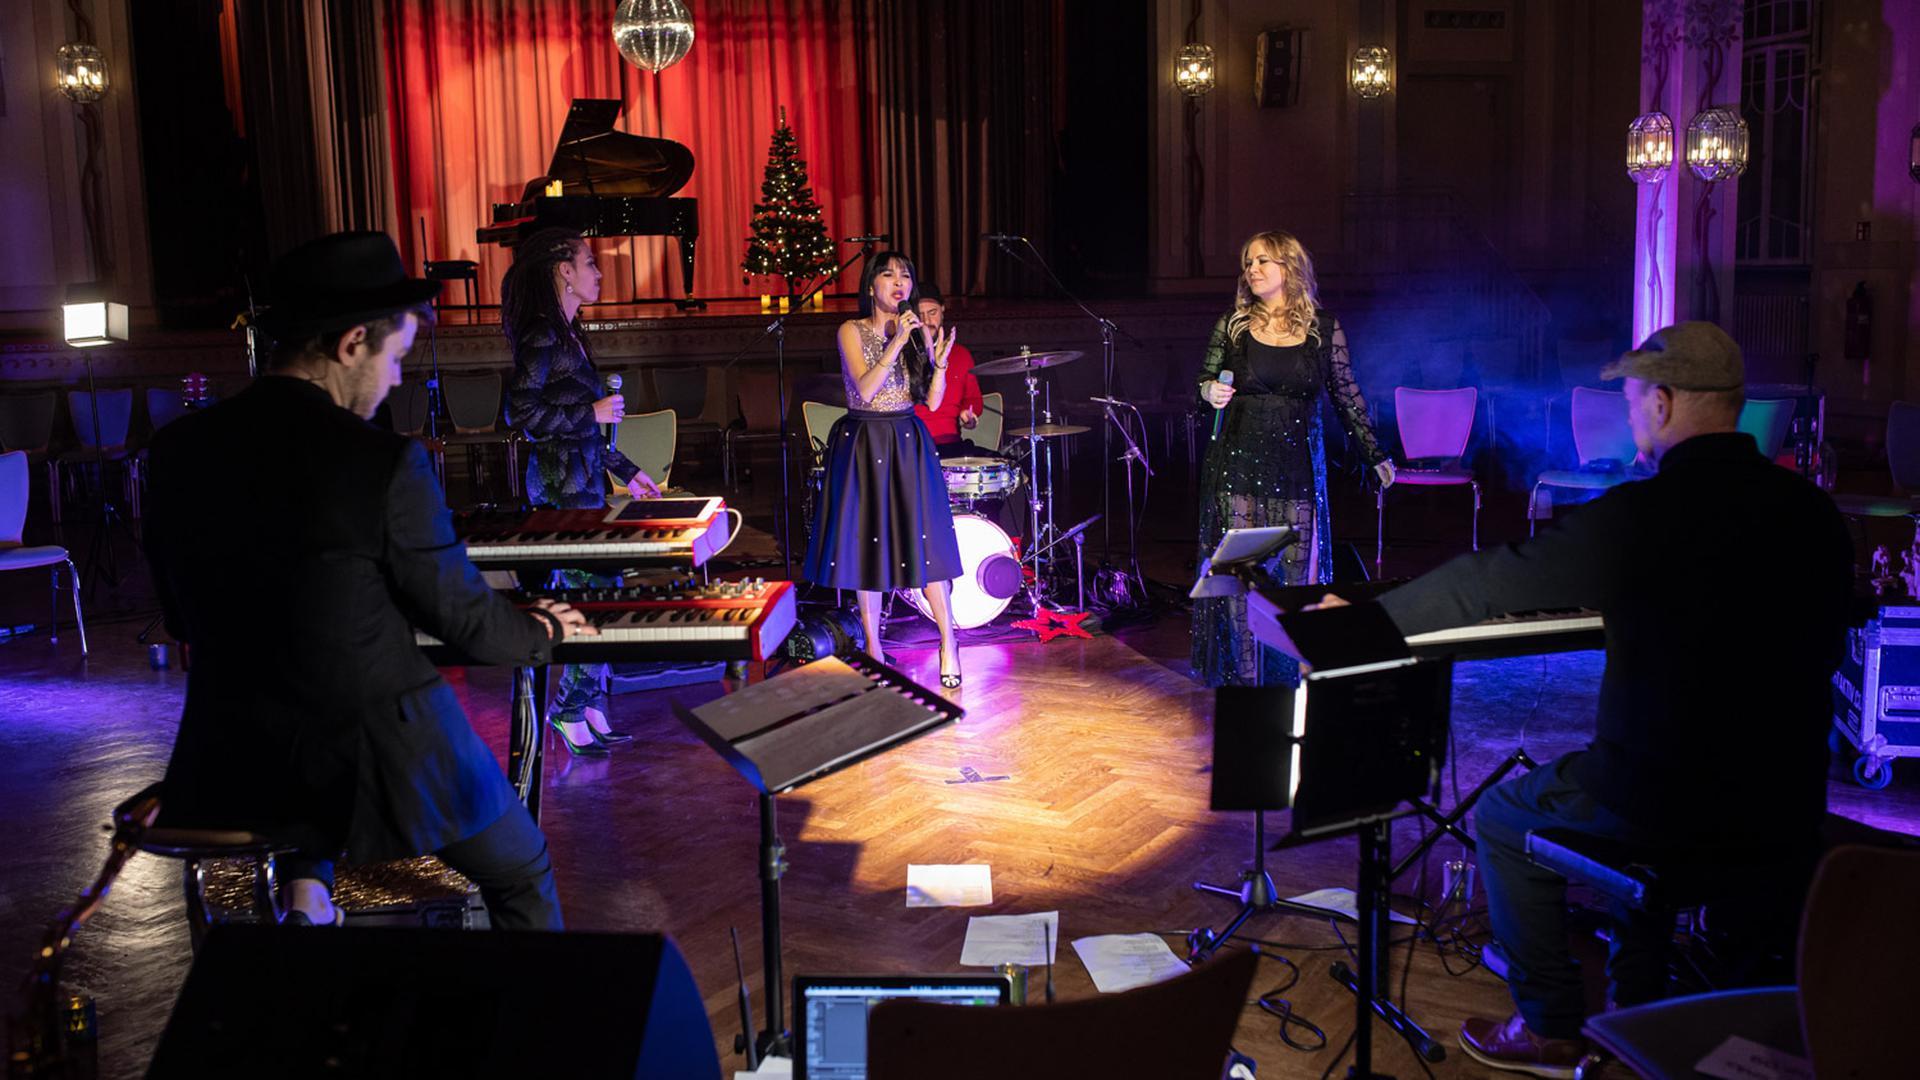 Musiker in Halle